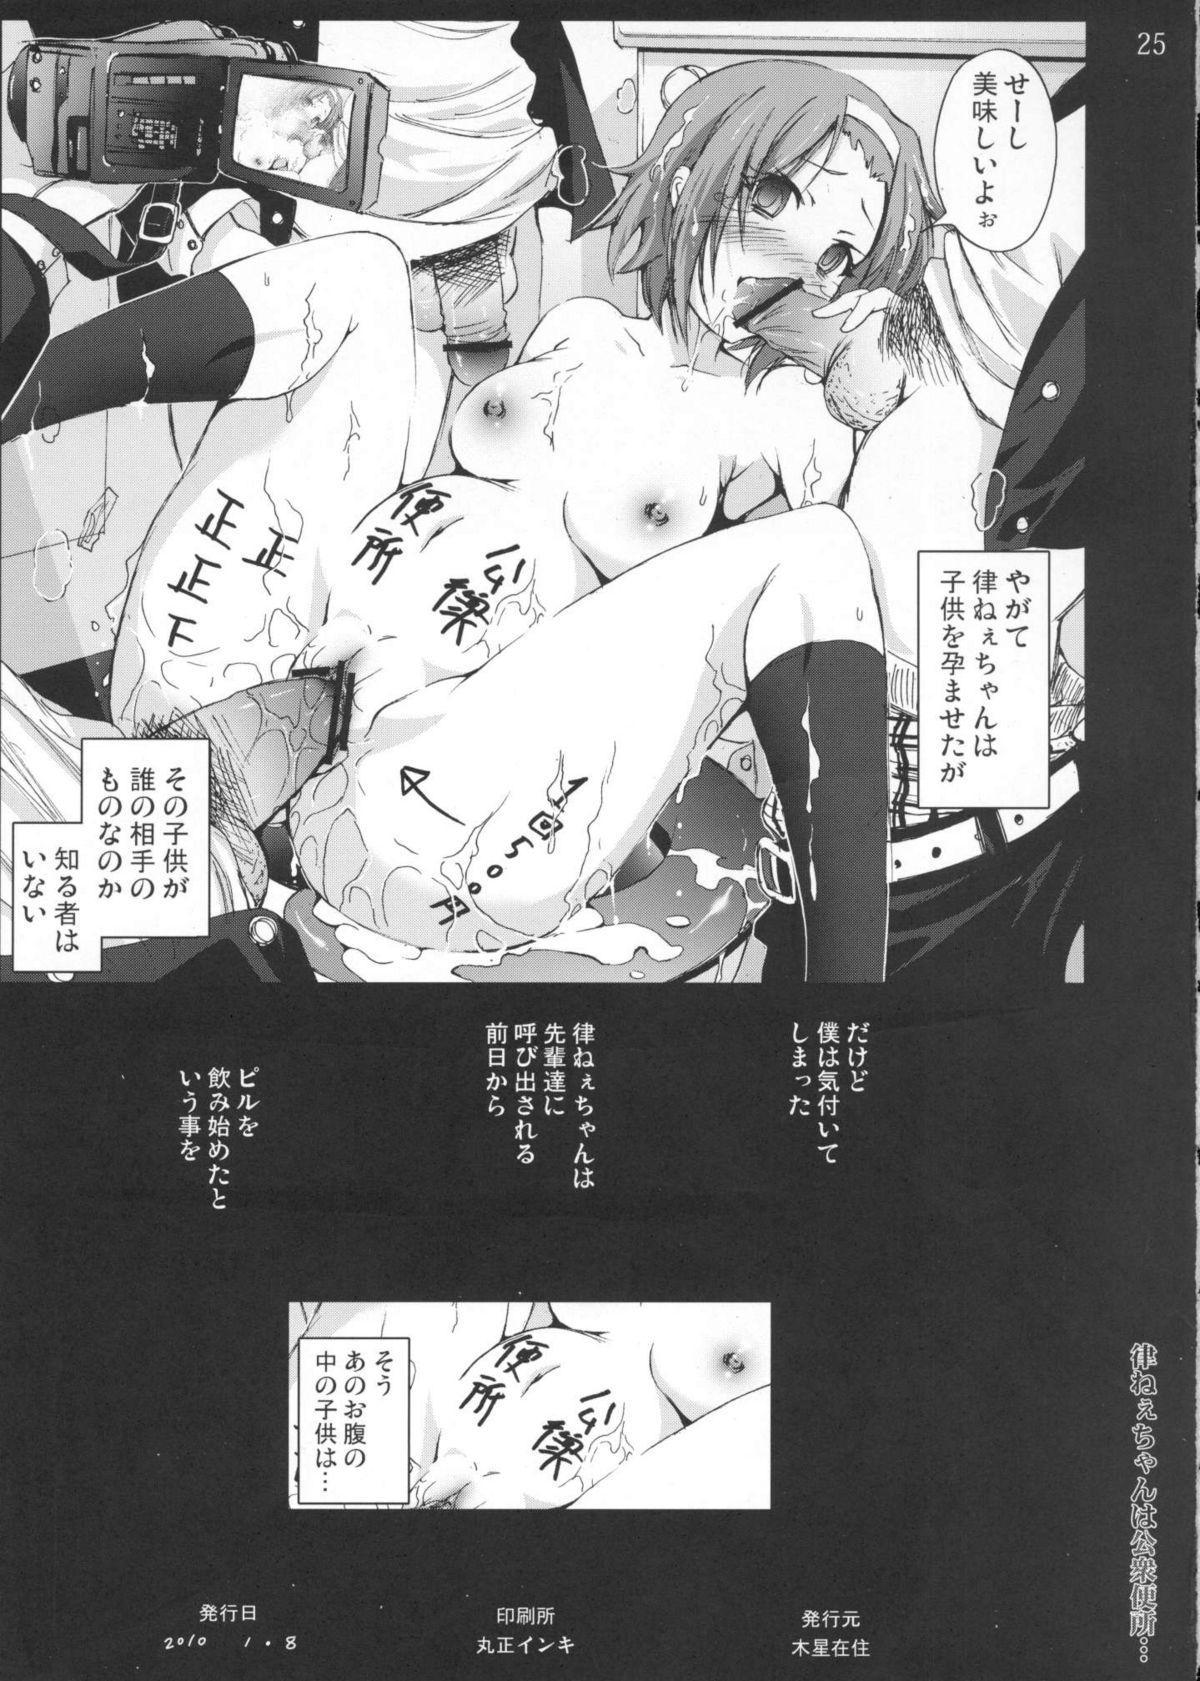 Ritsu-neechan wa Koushuu Benjo... 23